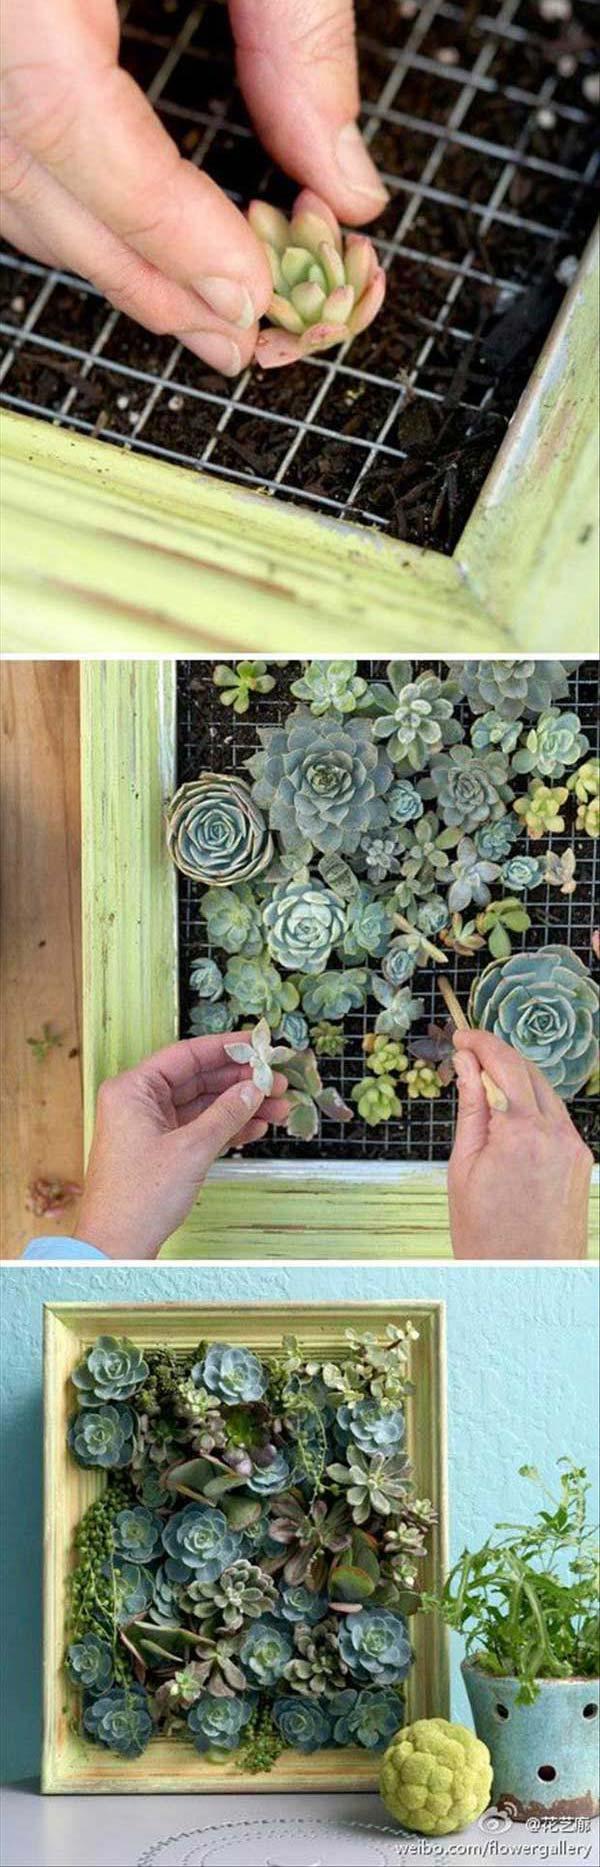 25 Maravillosas Ideas para Tu Mini Jardin